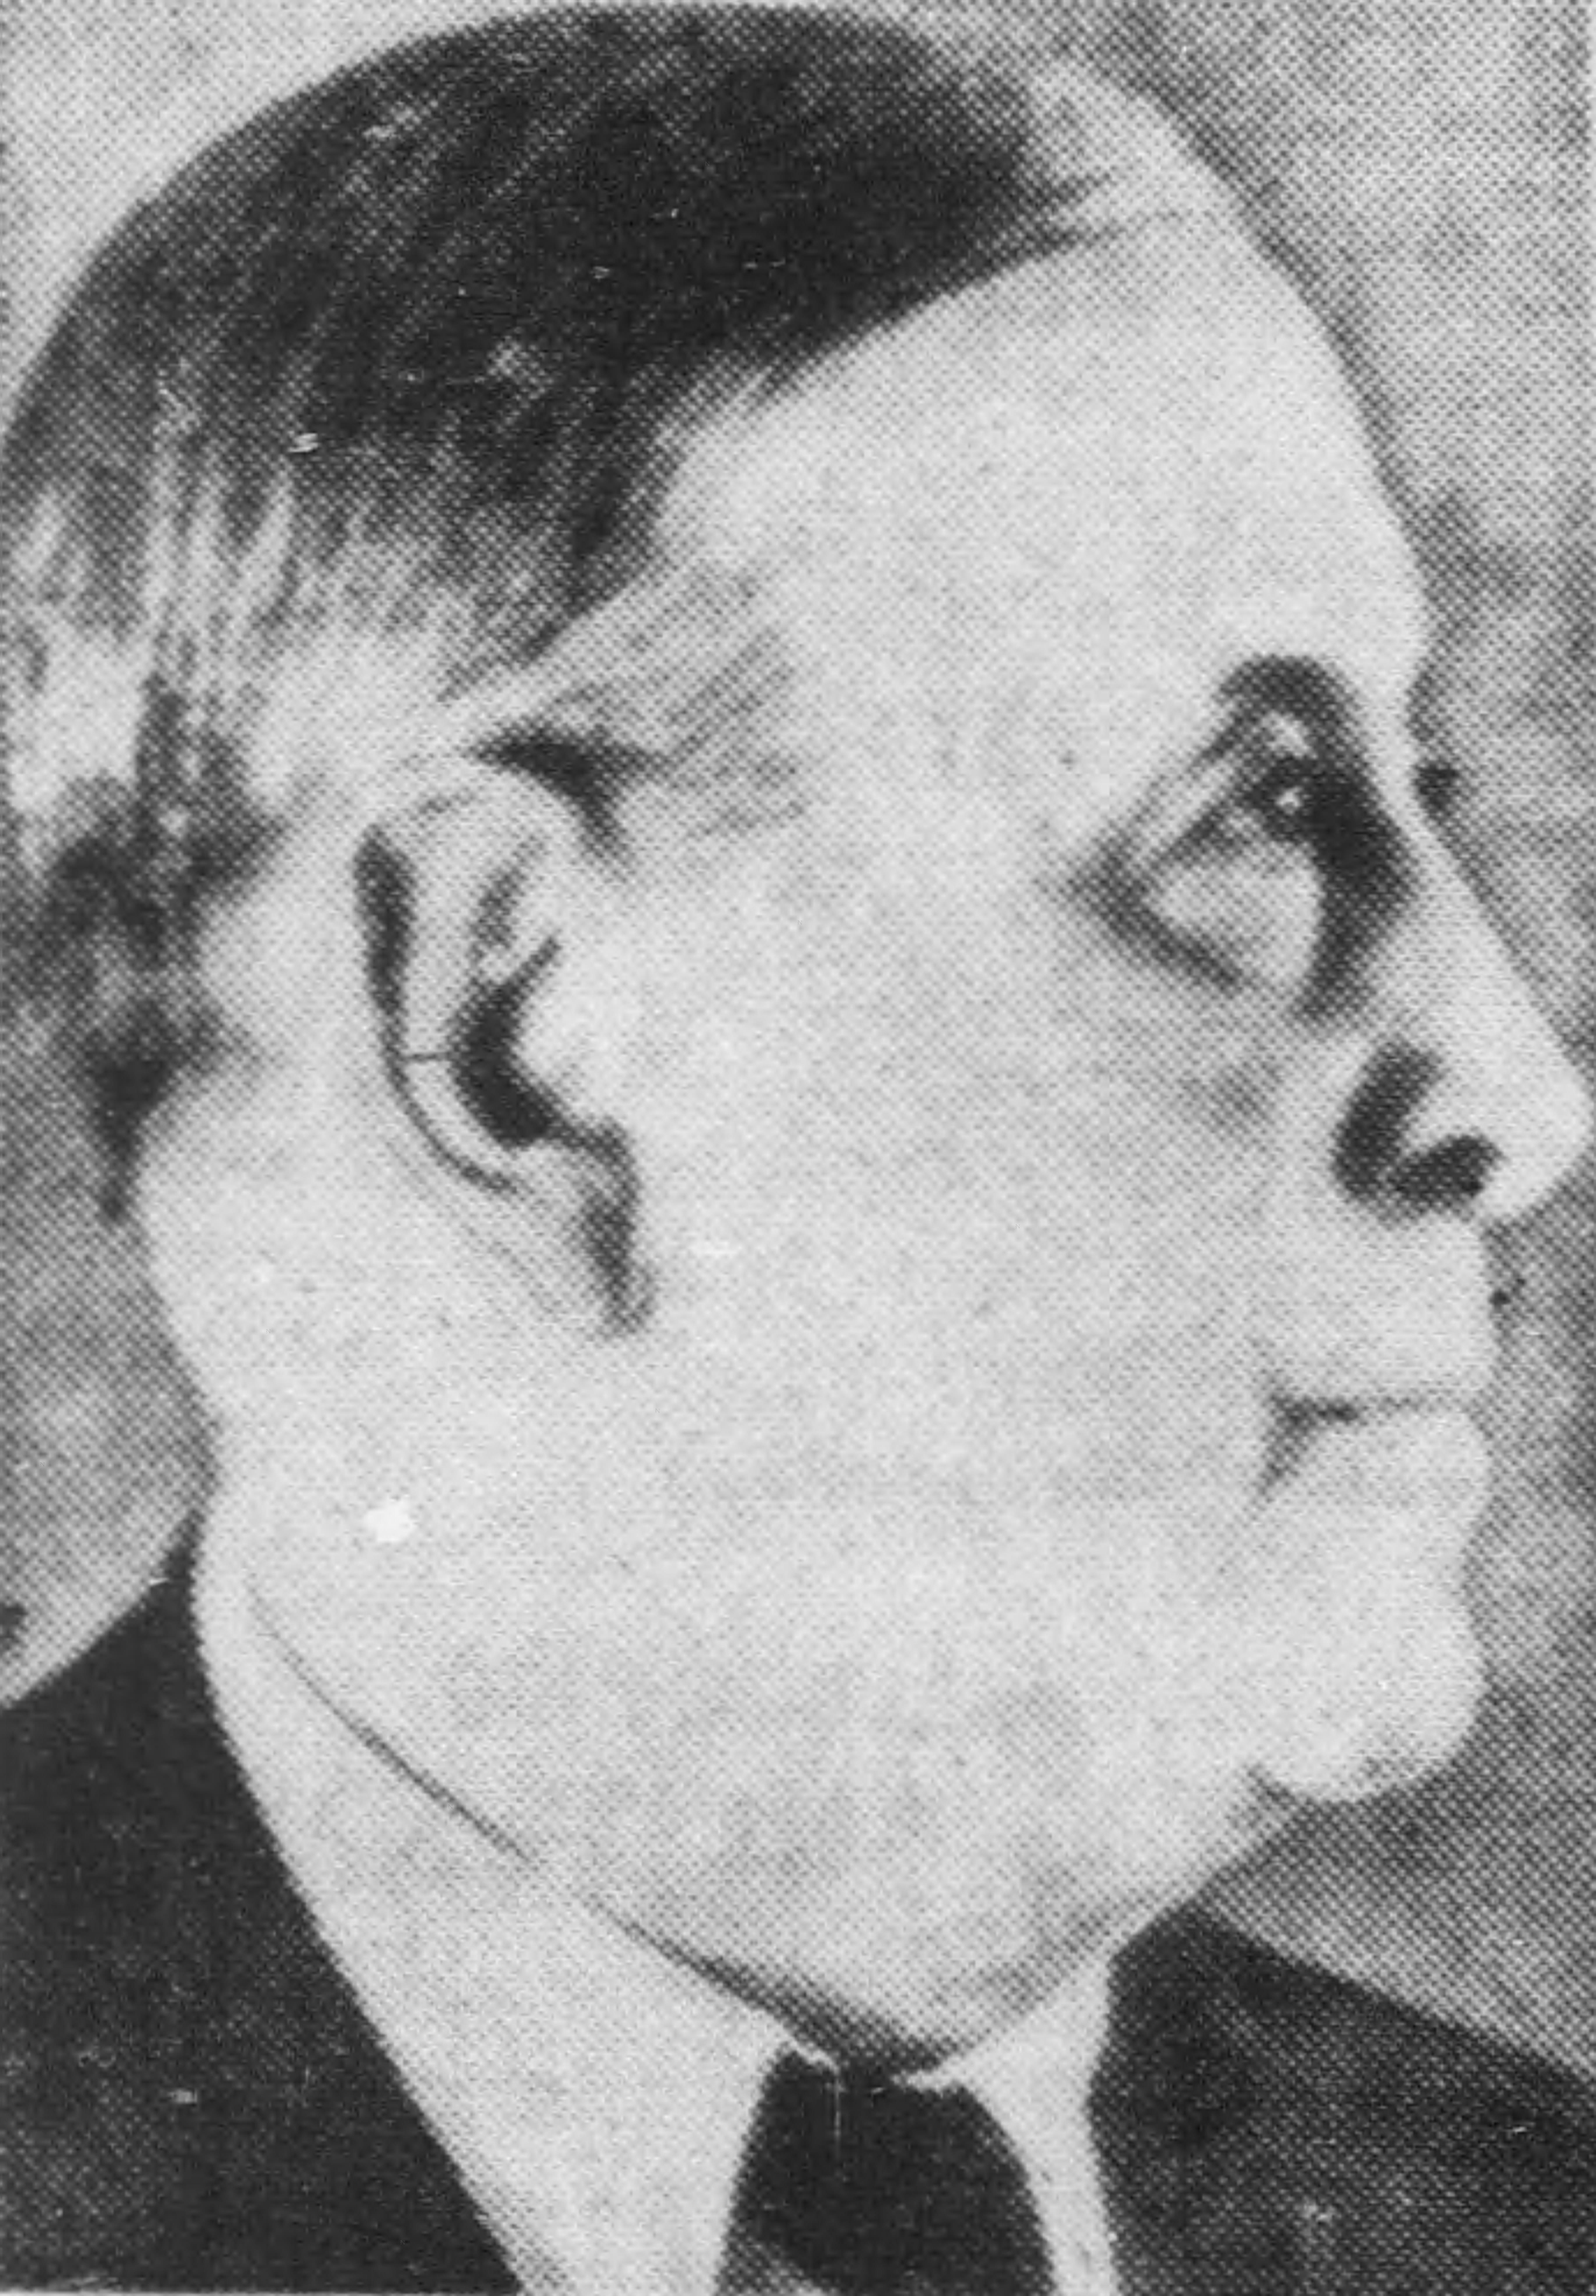 Dr. Antonio Caetano Deabreu Freire Egas Moniz